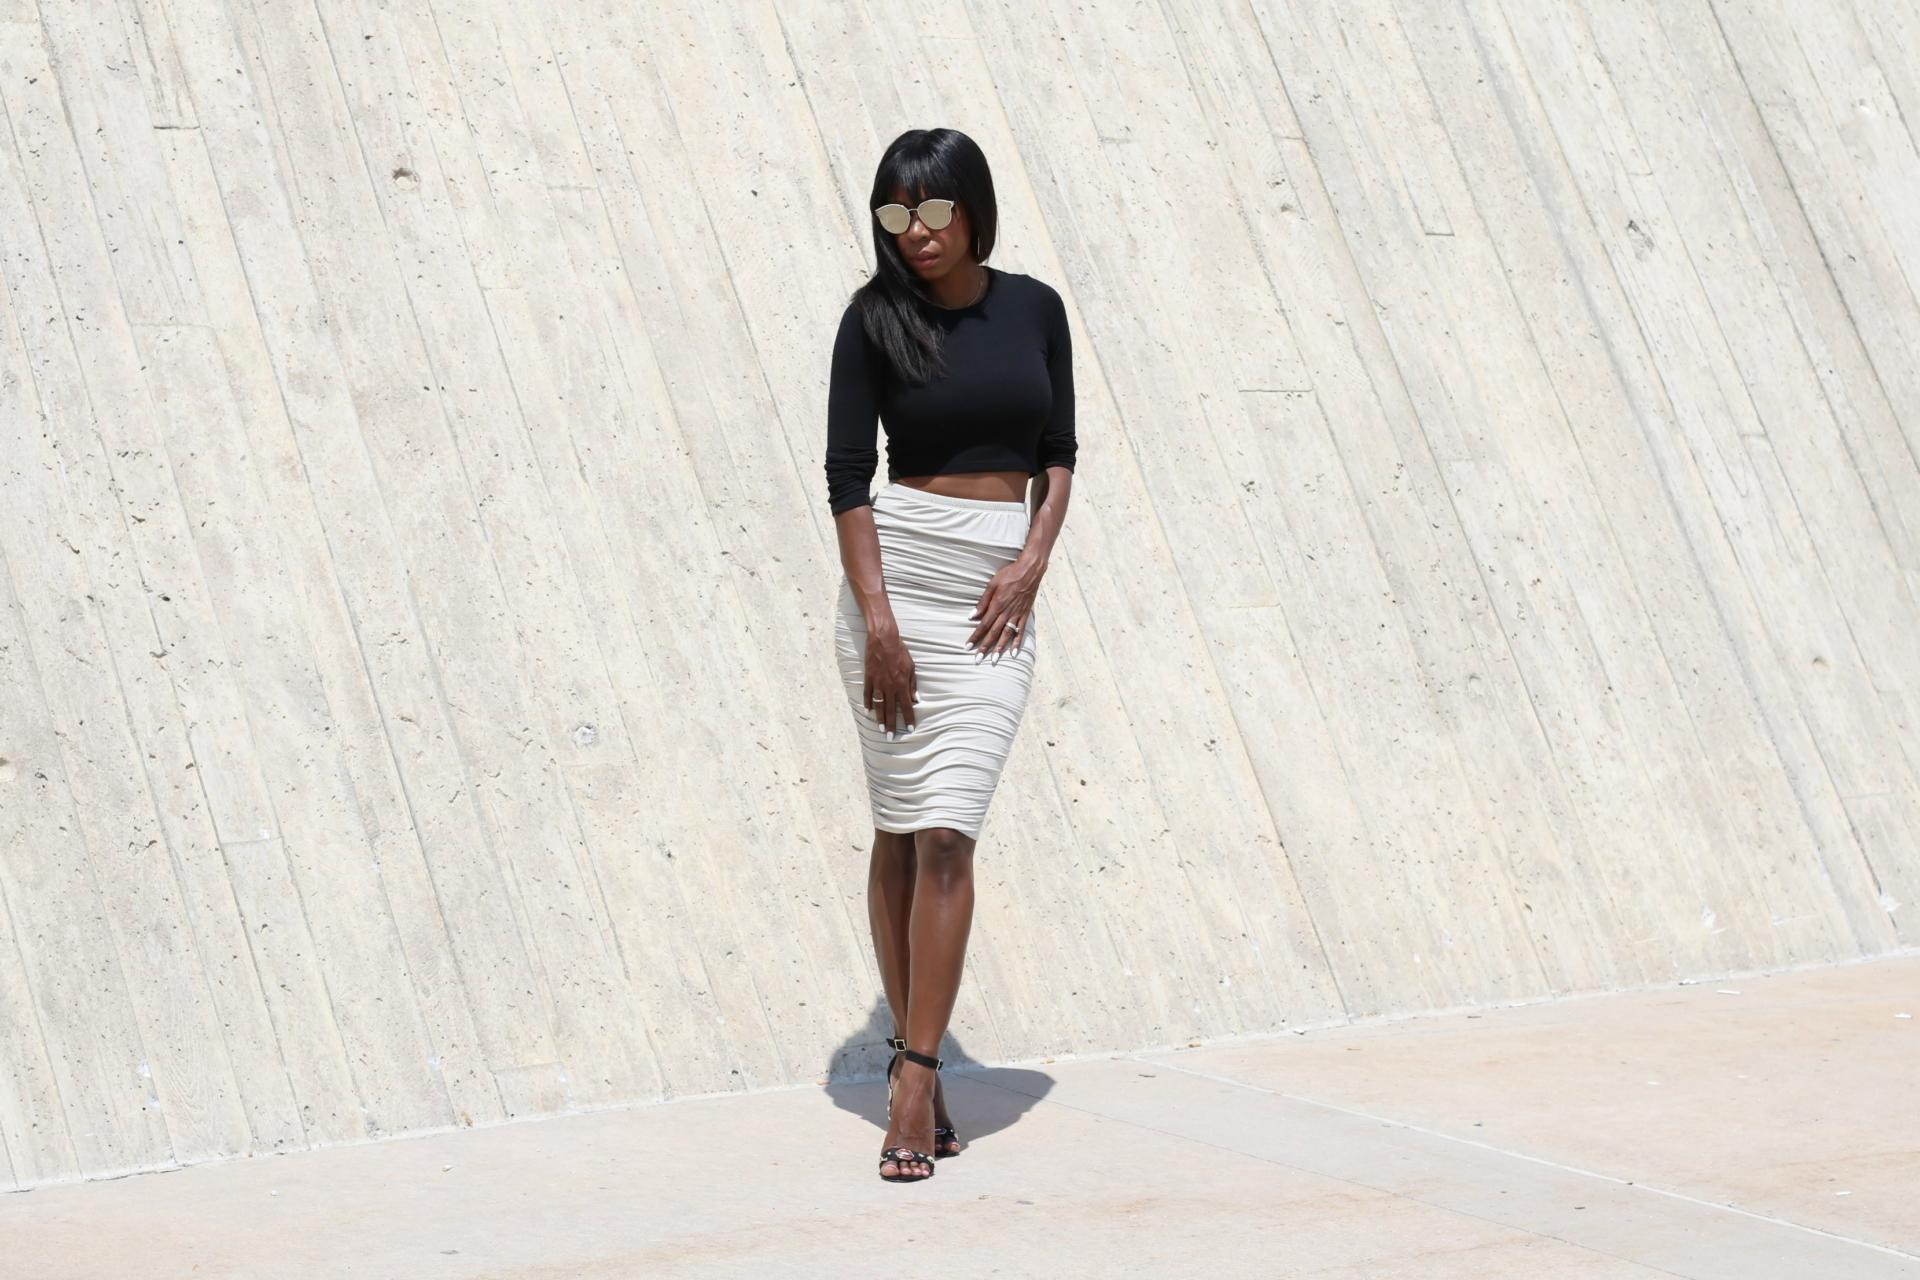 724 High-Waisted Skirt